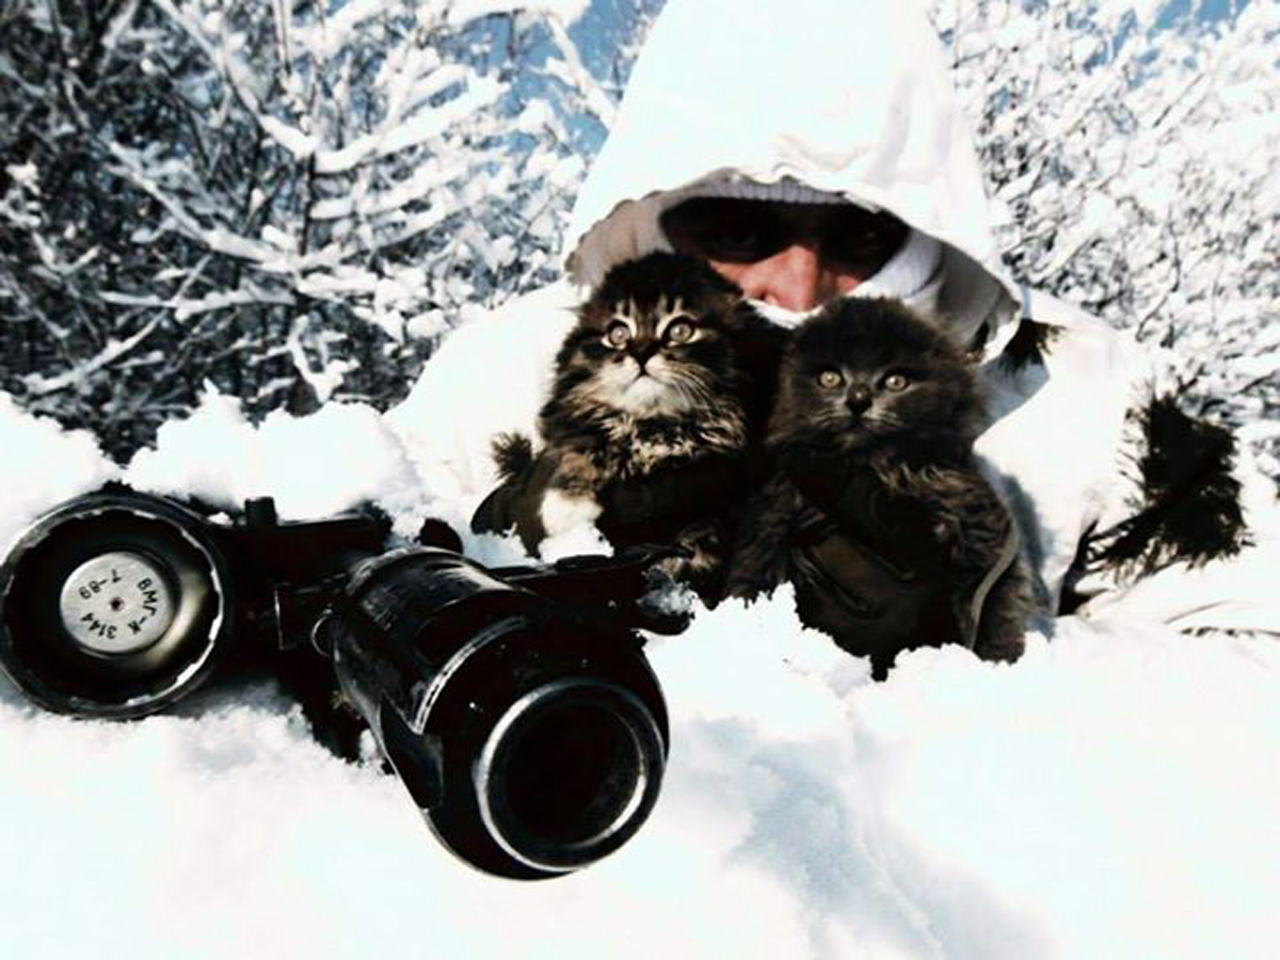 За що котам в АТО треба поставити пам'ятник-9 - фото 8